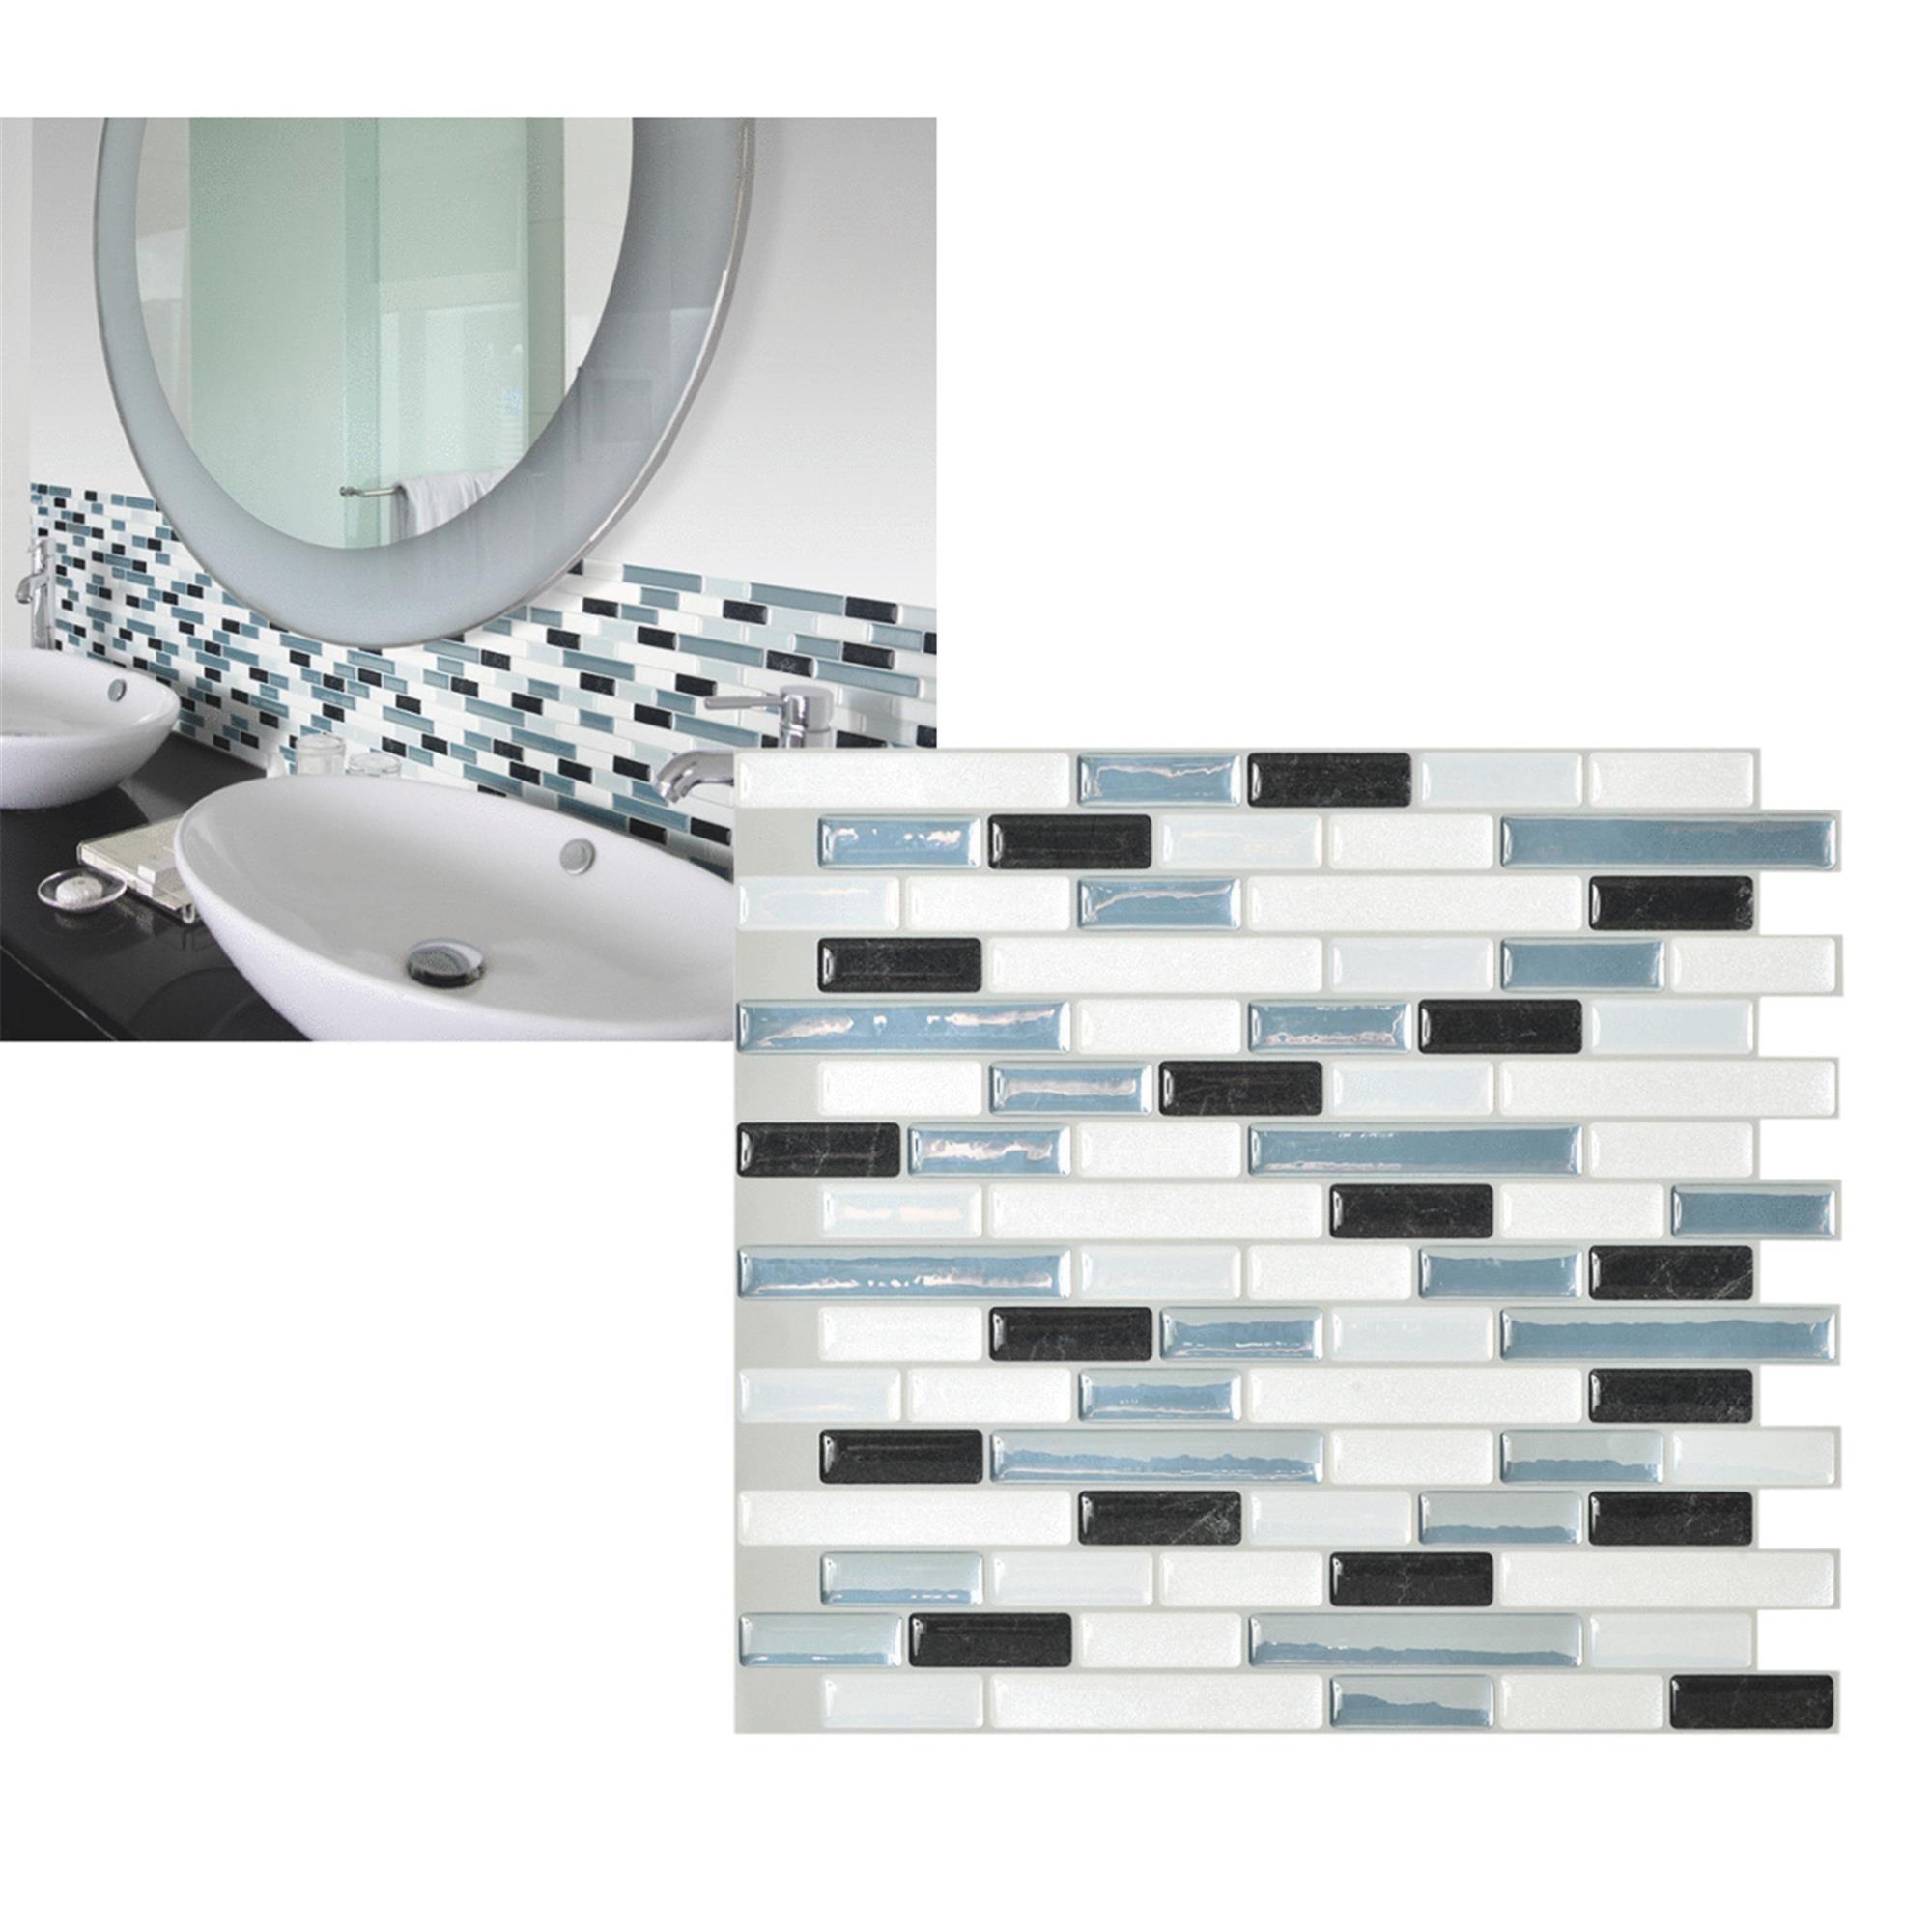 Smart Tiles Original Peel Stick Backsplash Wall Tile By Smart Tiles Shop Online For Homeware In Australia